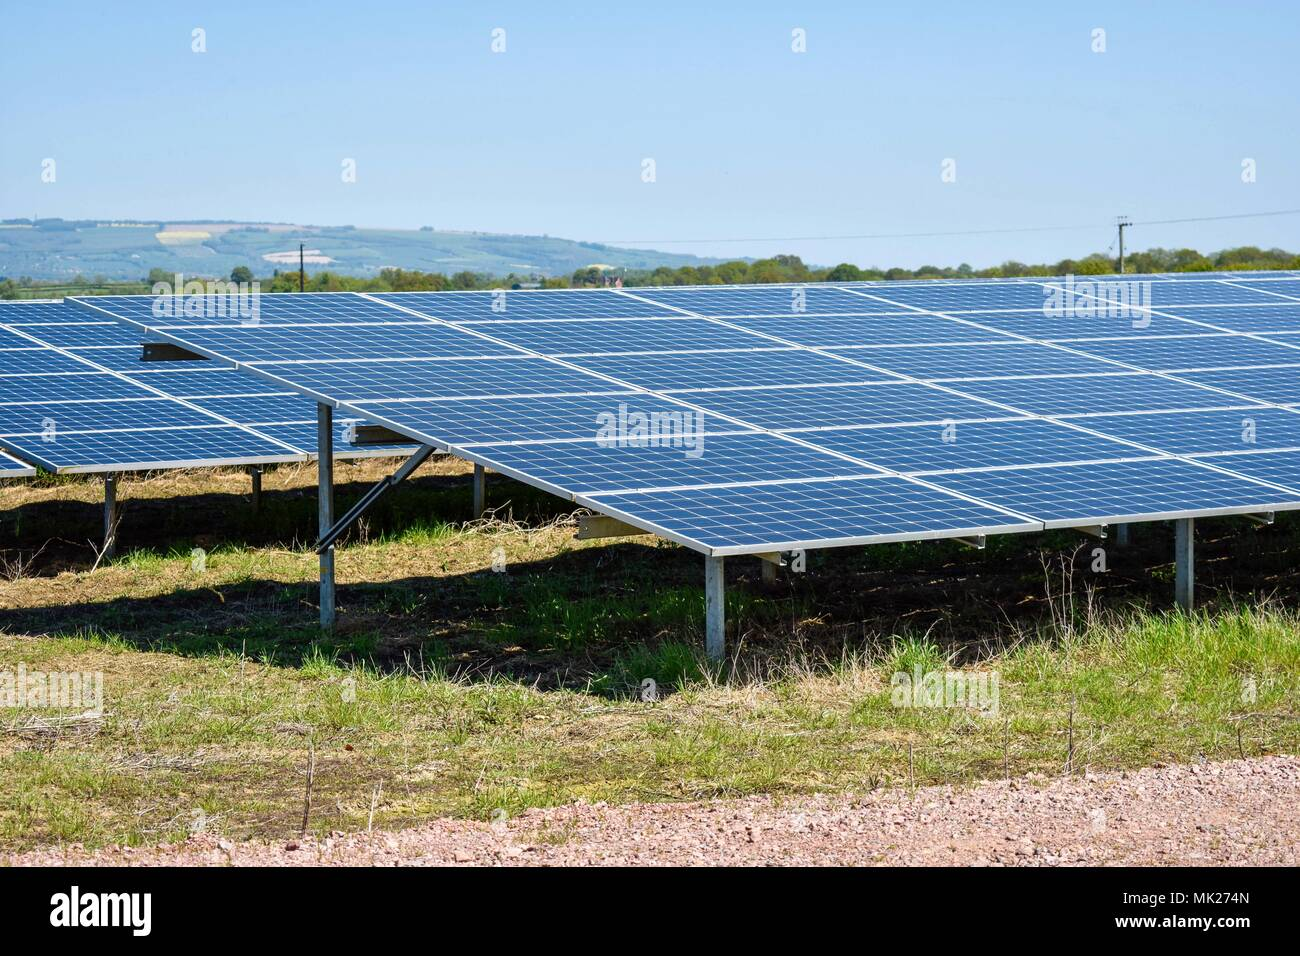 Solar panels at a solar farm, Gloucestershire, UK - Stock Image